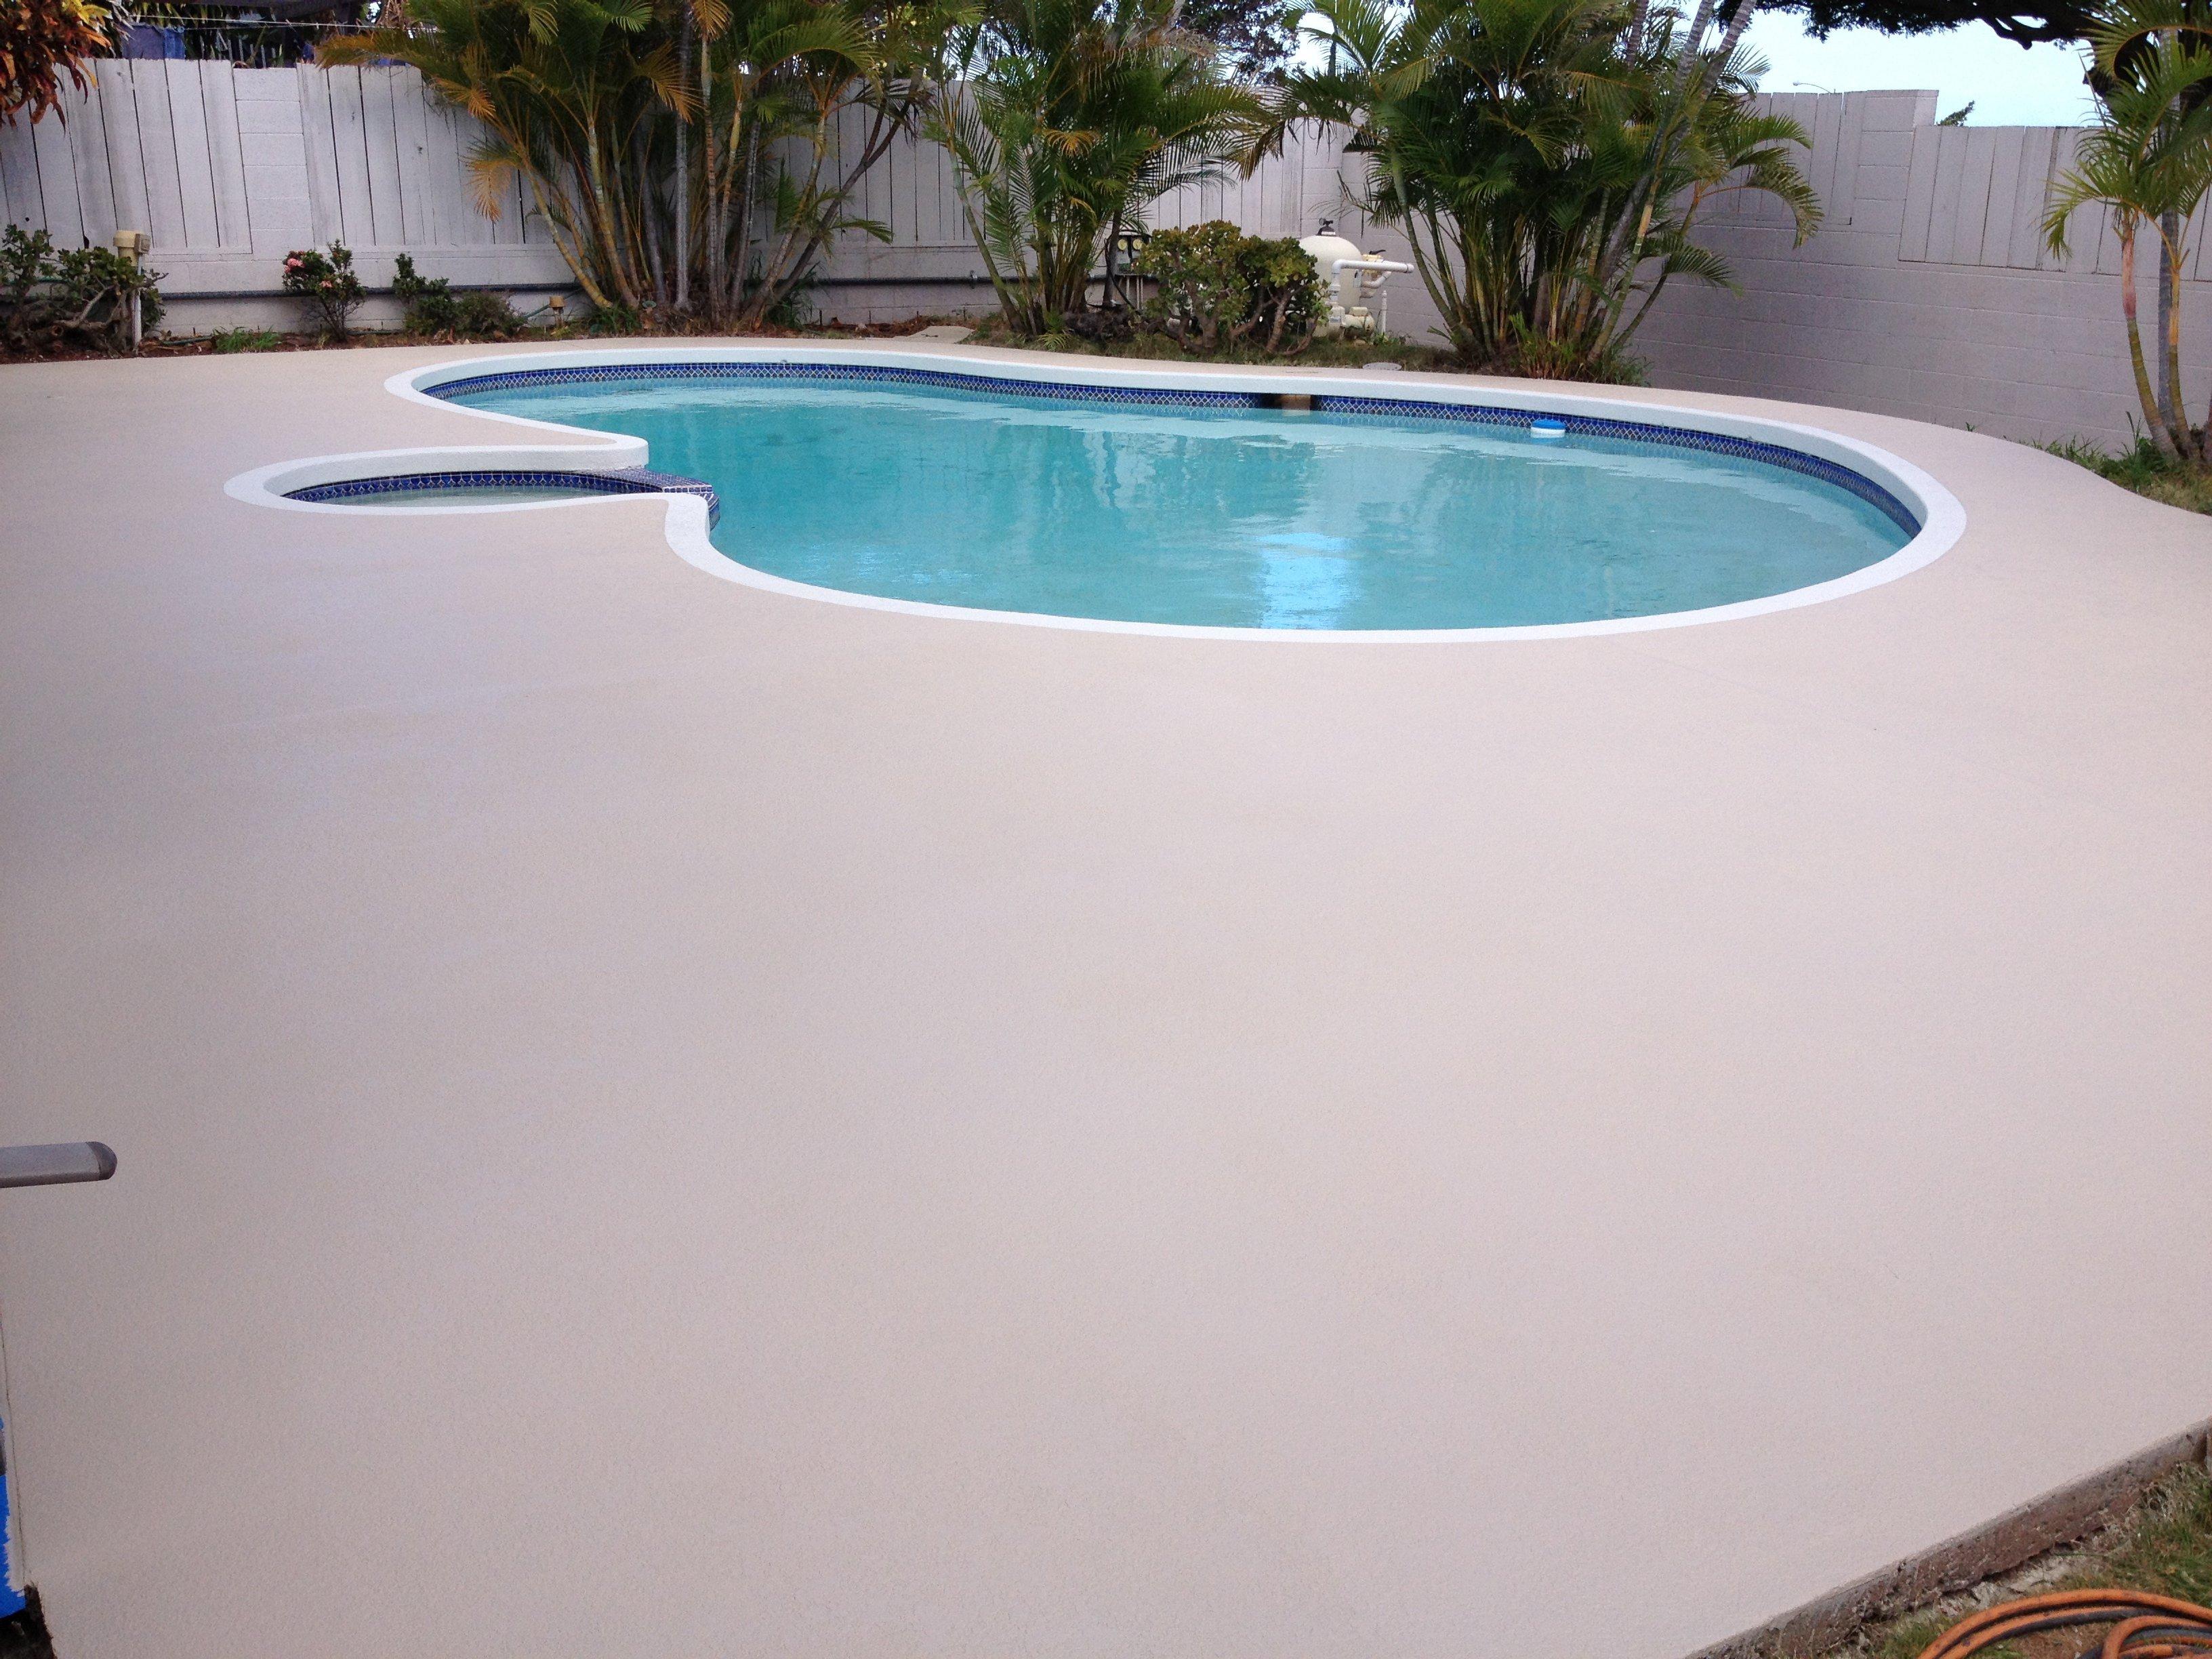 Concrete swimming pool contractor waterproof coating - Waterproof paint for swimming pools ...